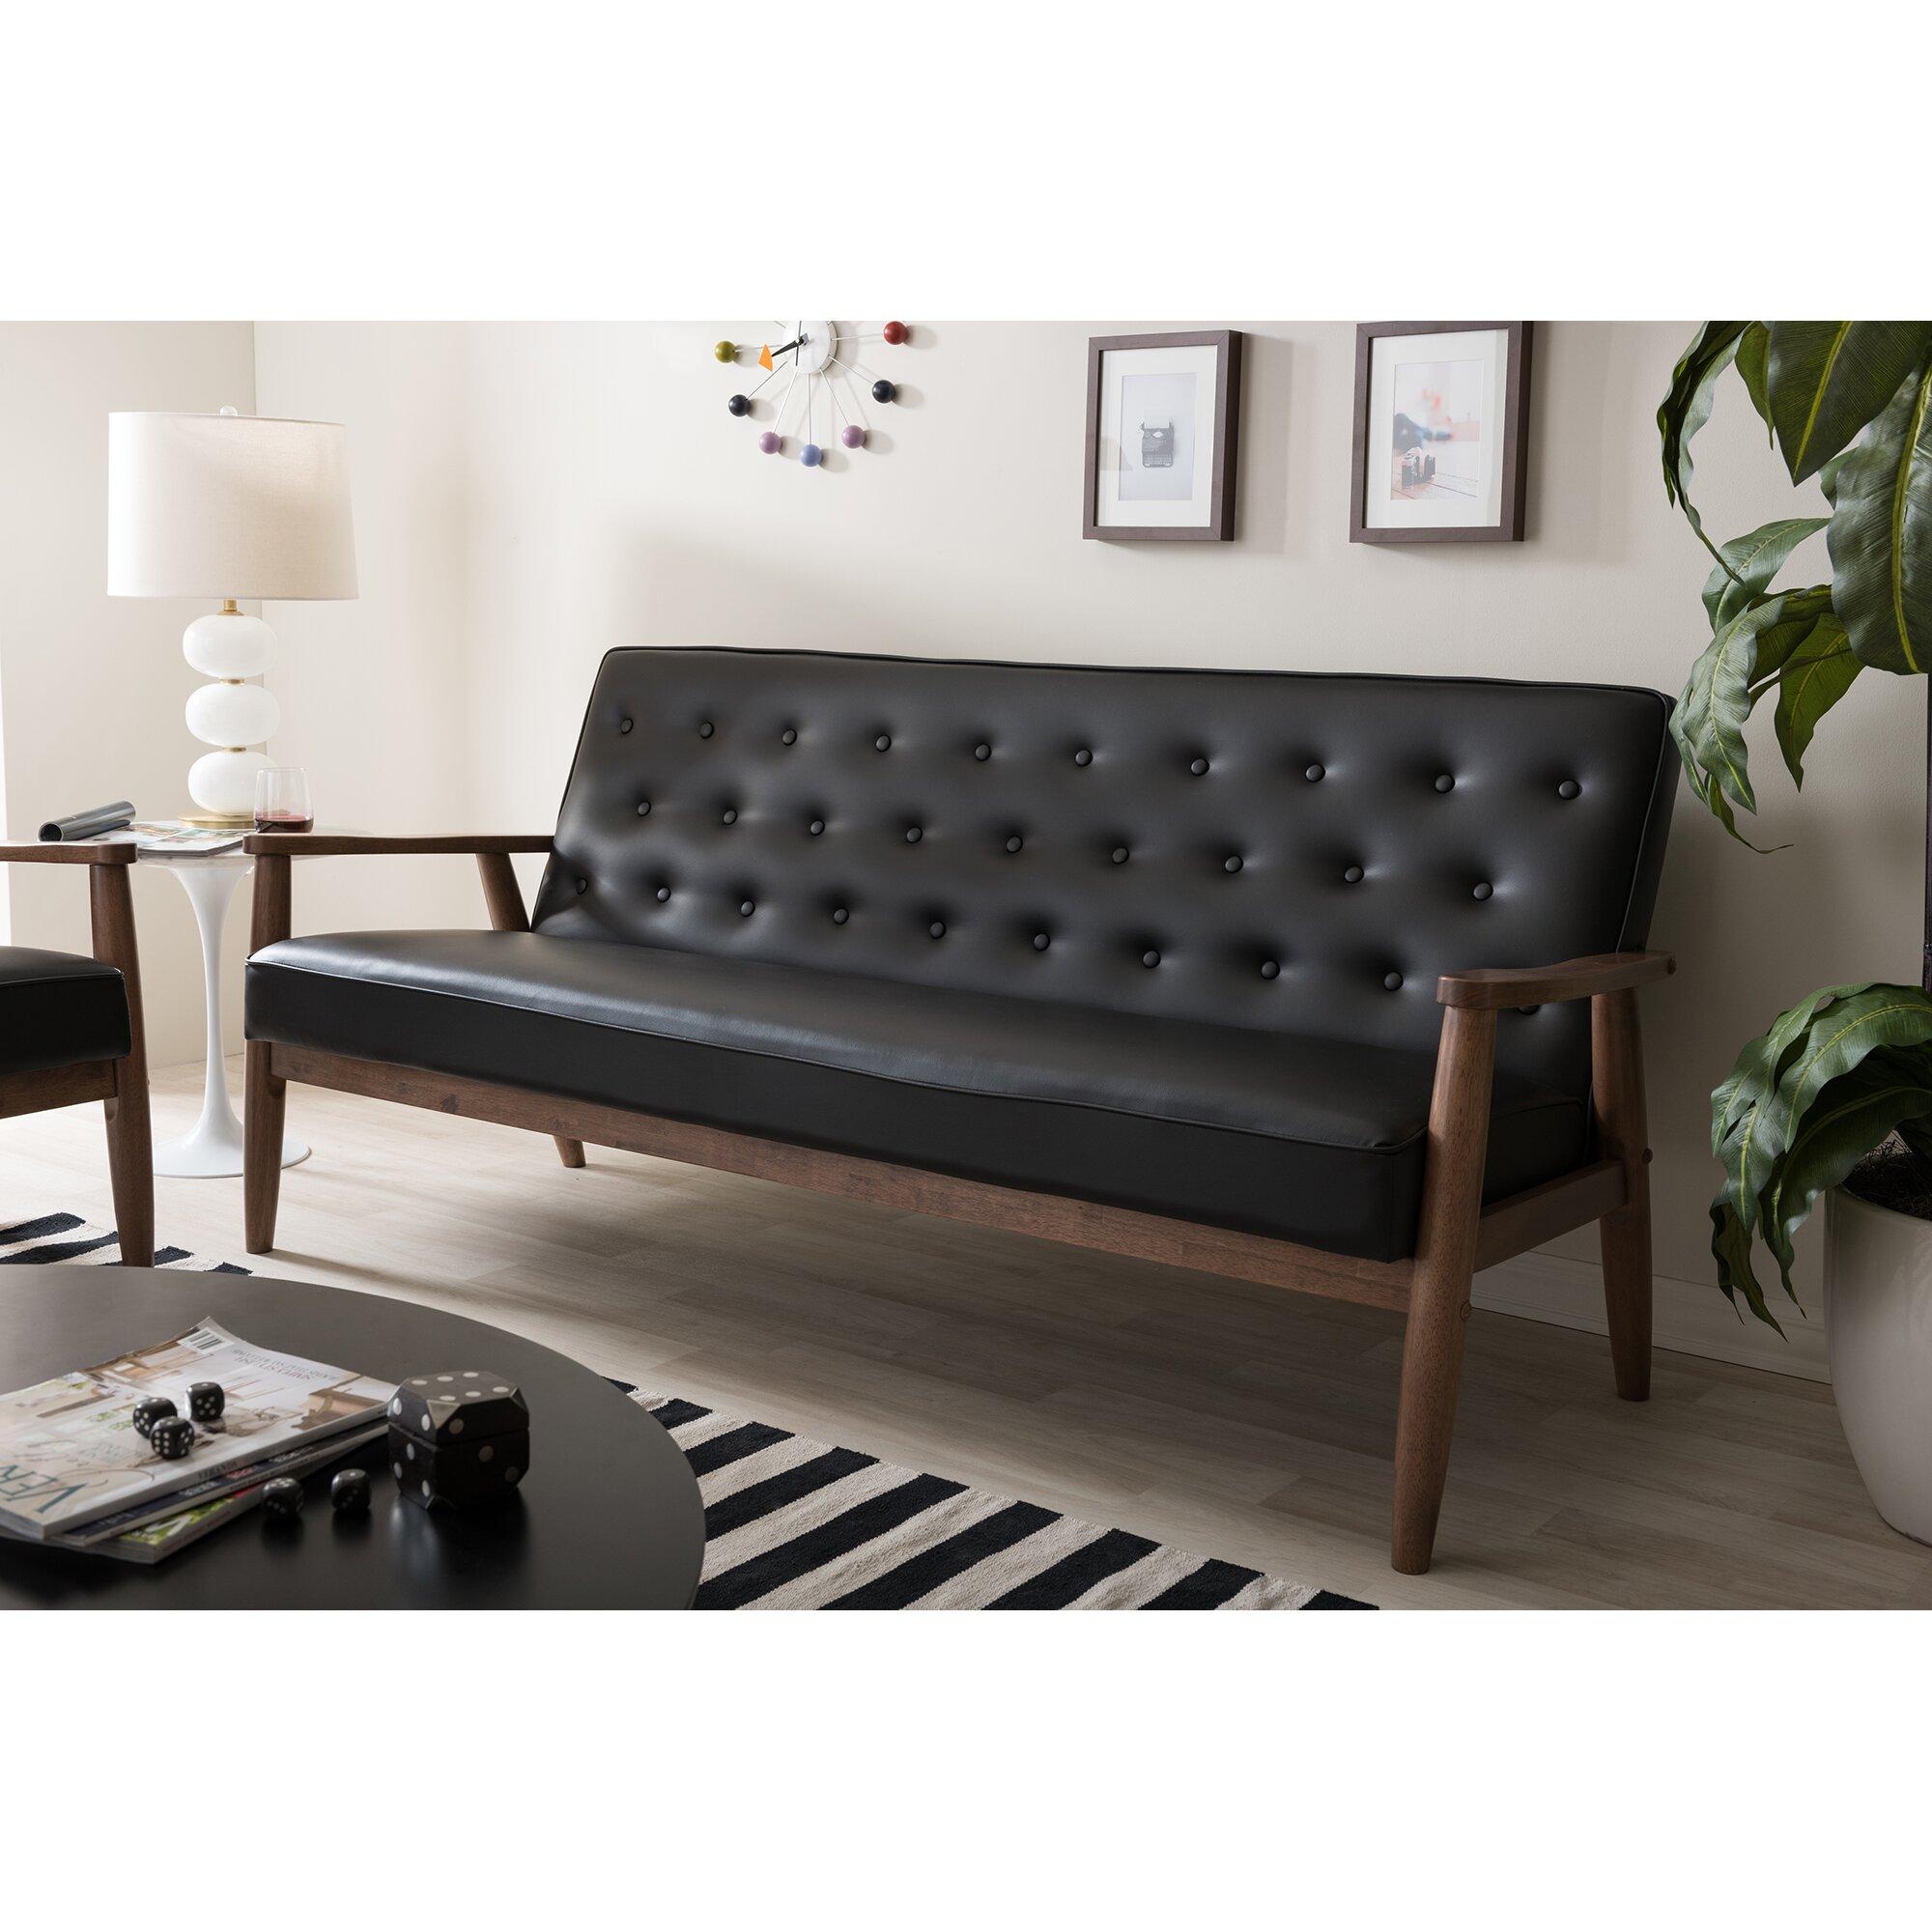 Baxton Studio Arcadia Fabric Upholstered Tufted 3seater Sofa Light